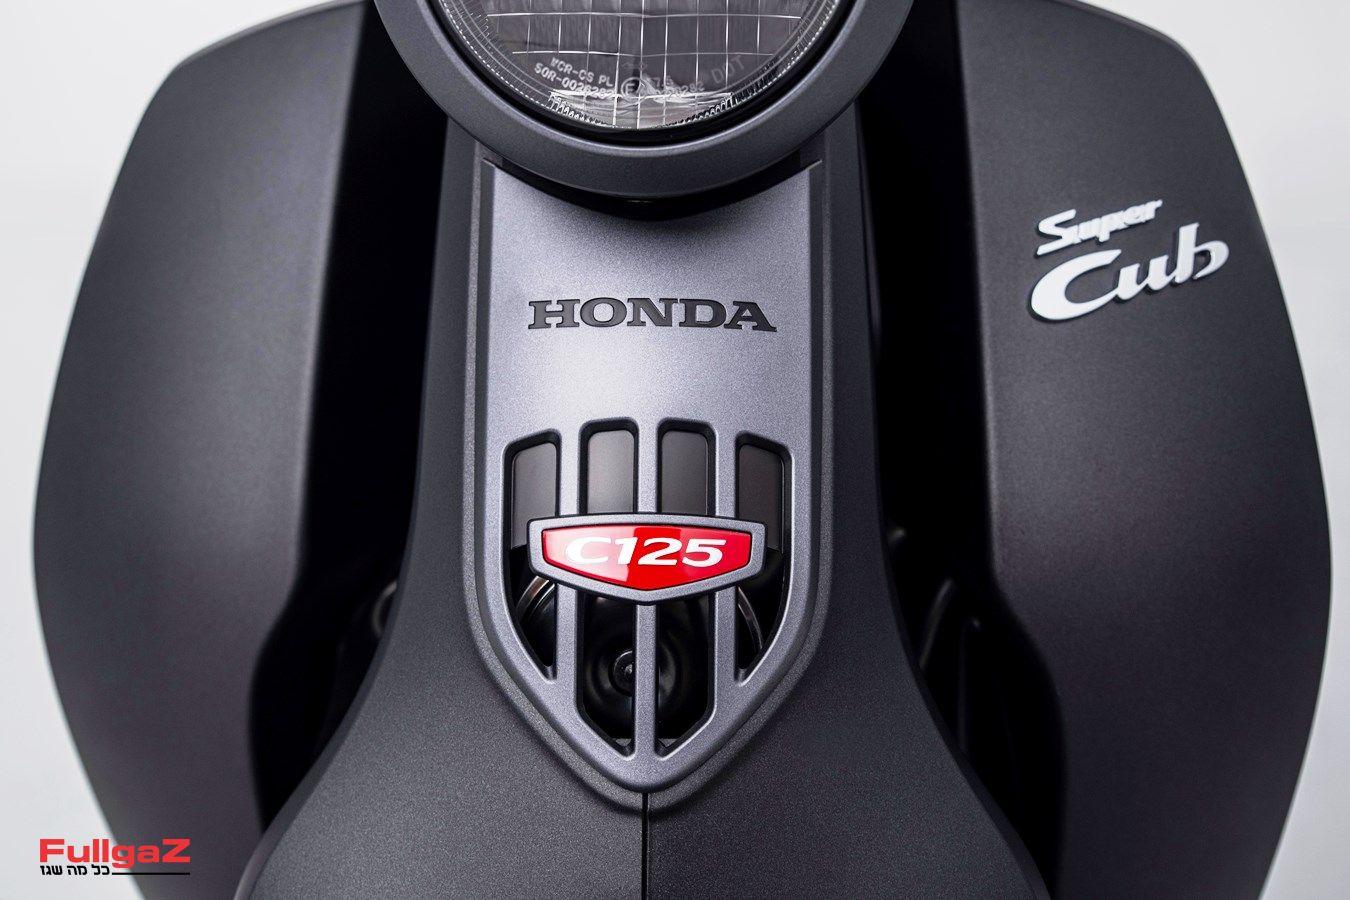 22YM HONDA SUPER CUB 125